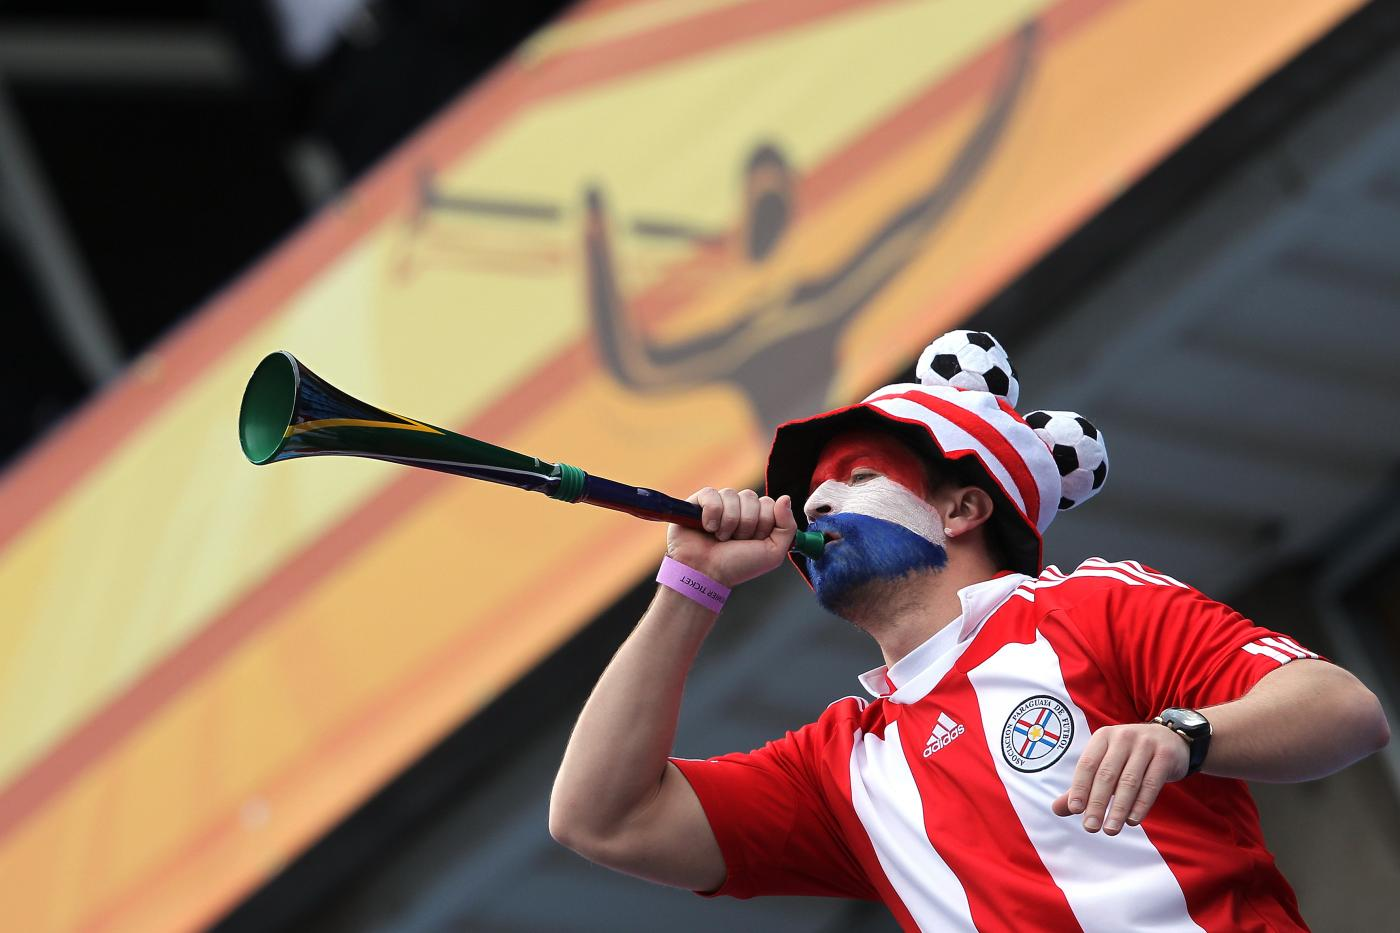 Paraguay Primera Division pronostico, sesta giornata: bis in chiusura